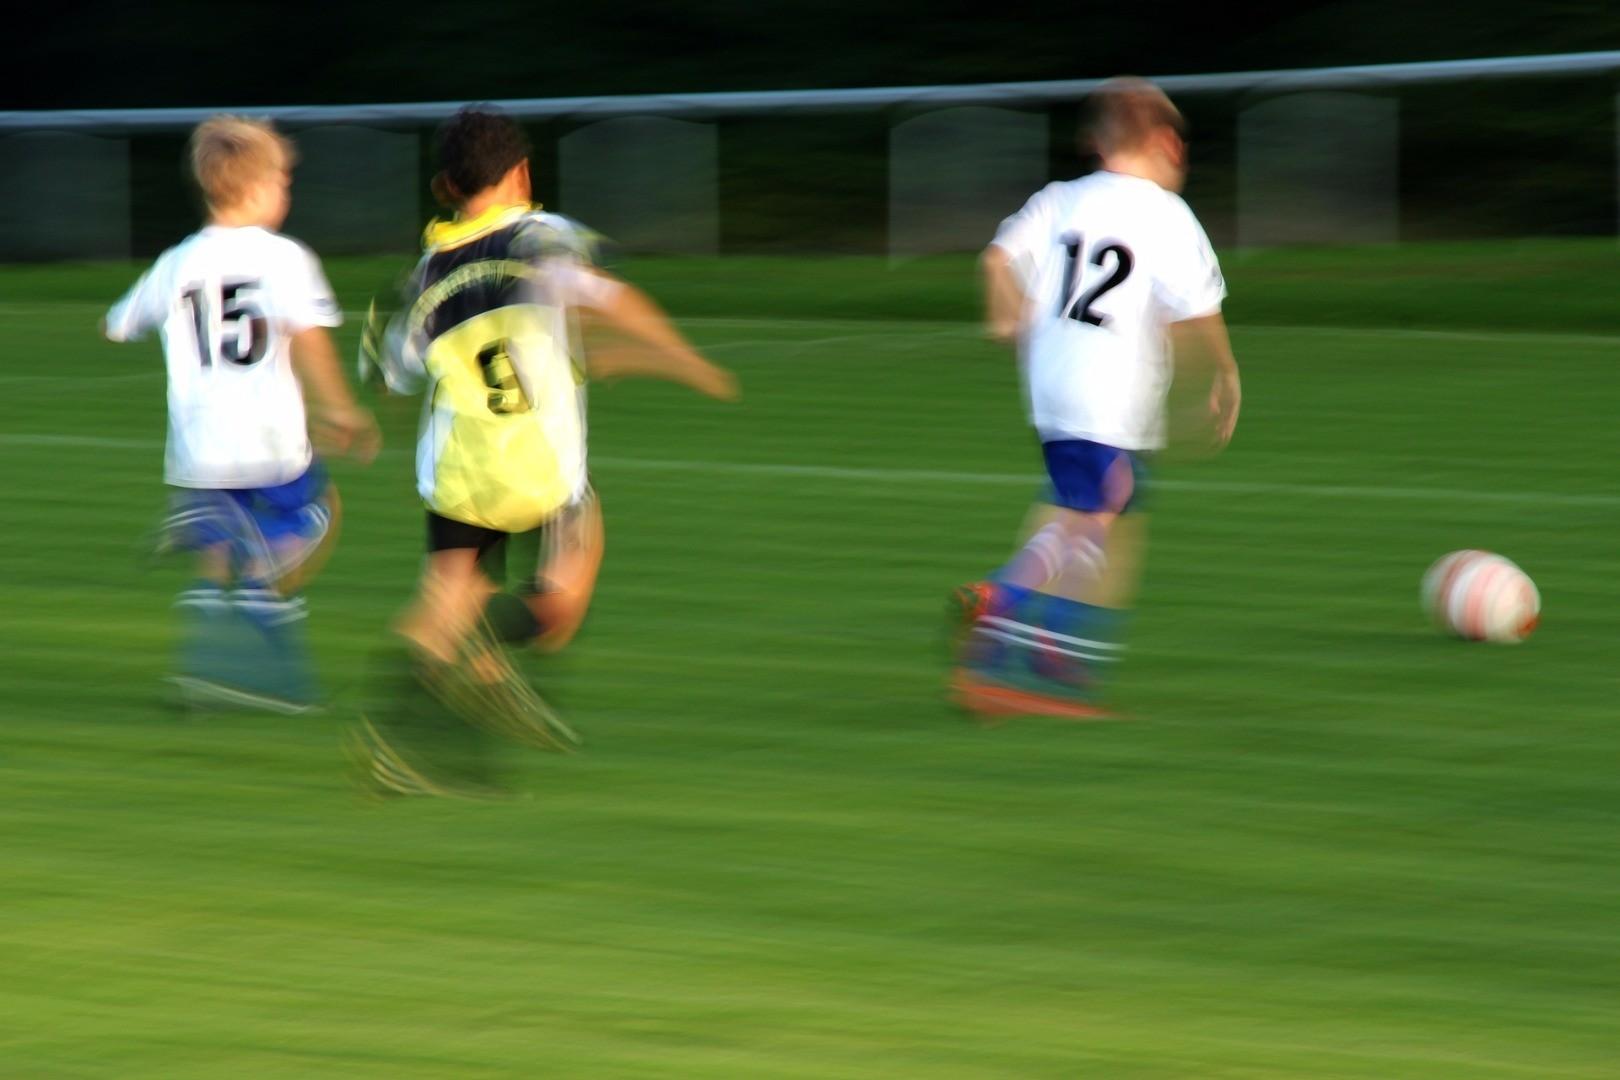 Fußballkinder.jpg